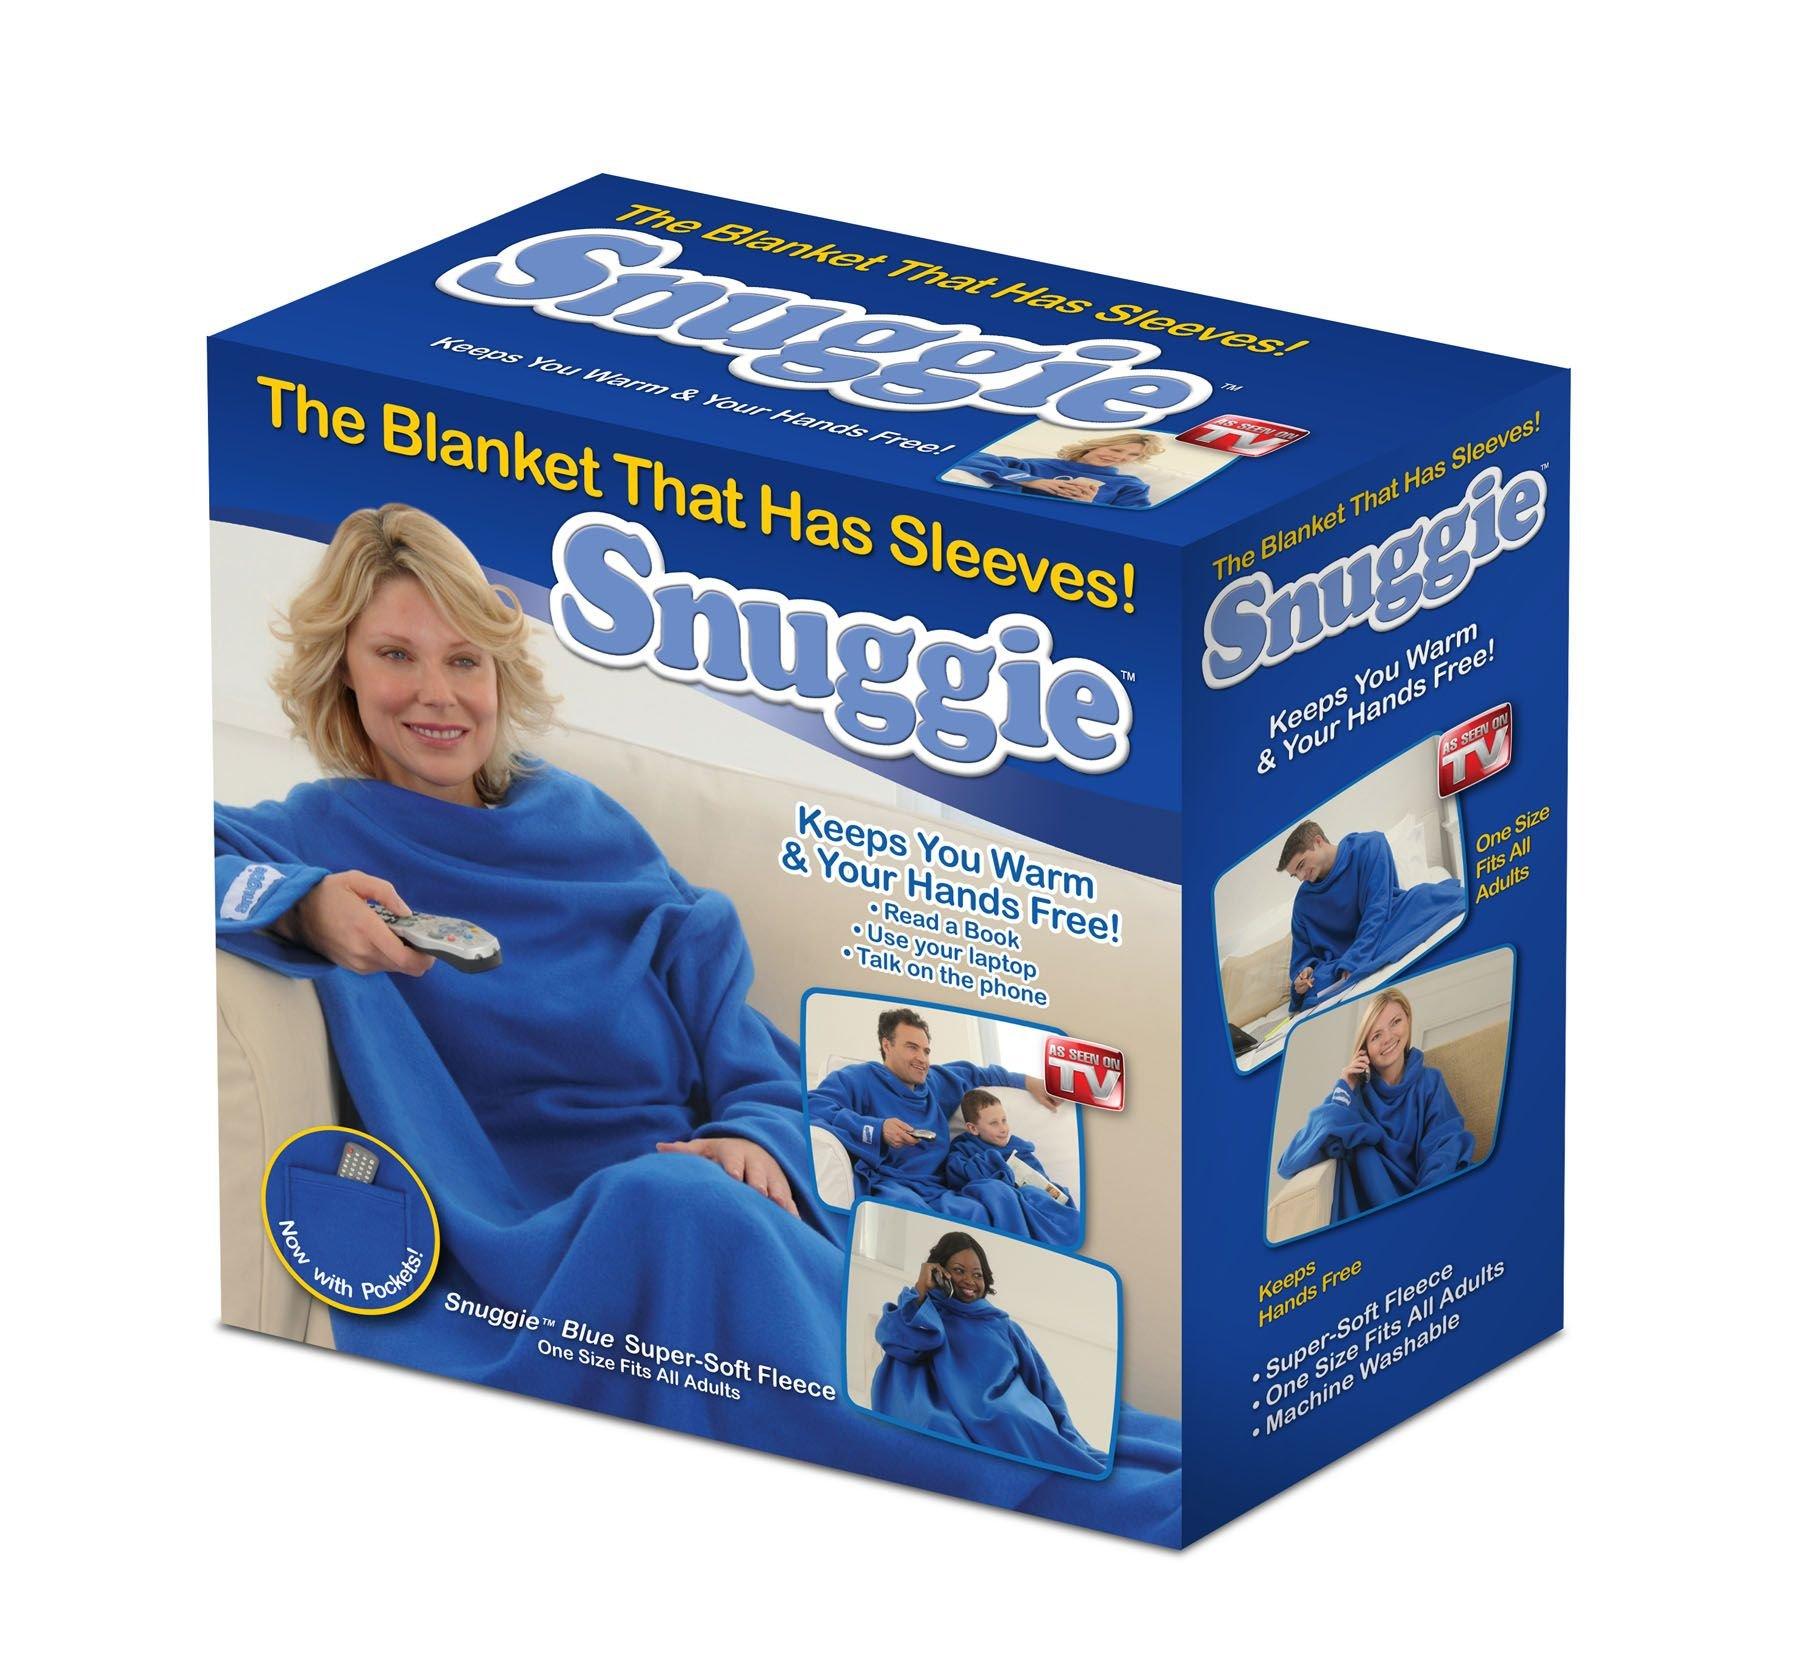 Snuggie True Fleece Blanket with Sleeves, Blue